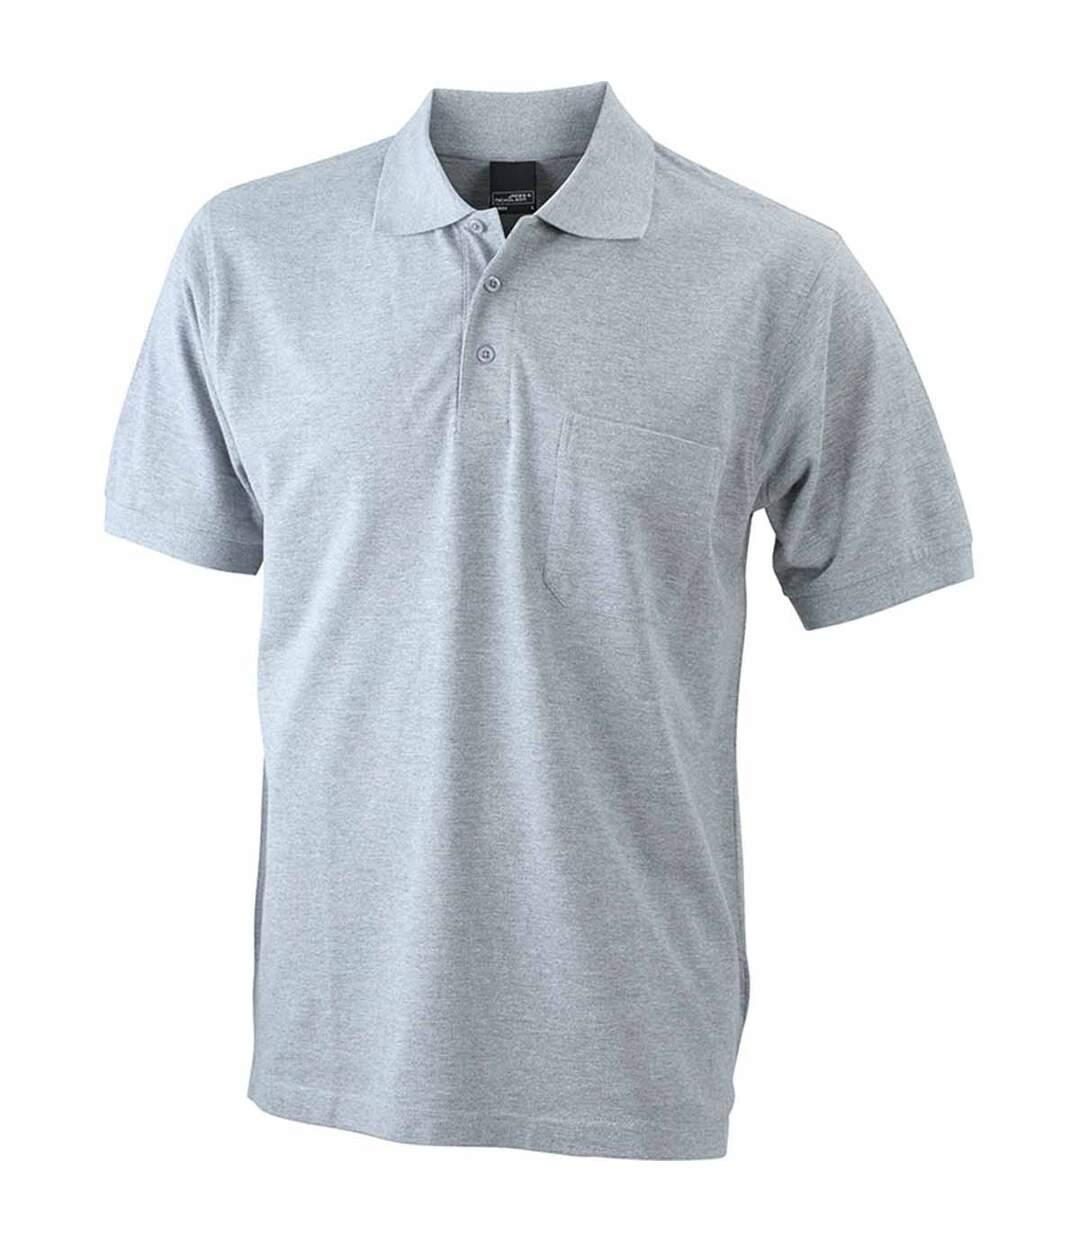 Polo manches courtes poche poitrine HOMME JN922 - gris chiné clair